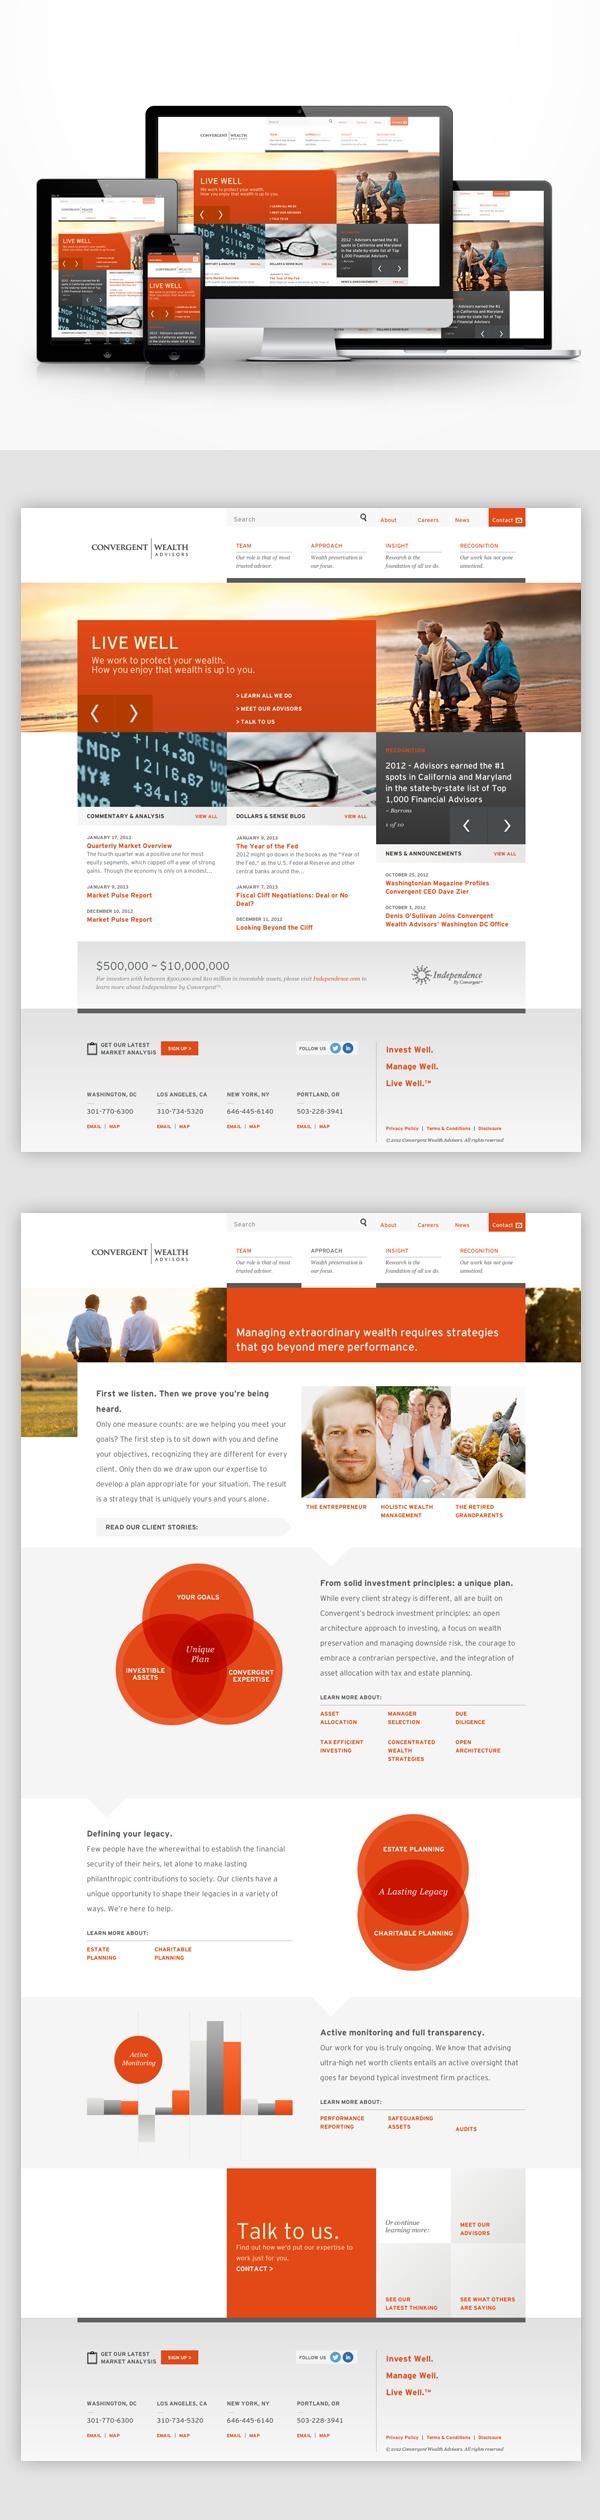 Convergent Wealth Advisors - Responsive website.  Designed by Sun Yun. #sunyun